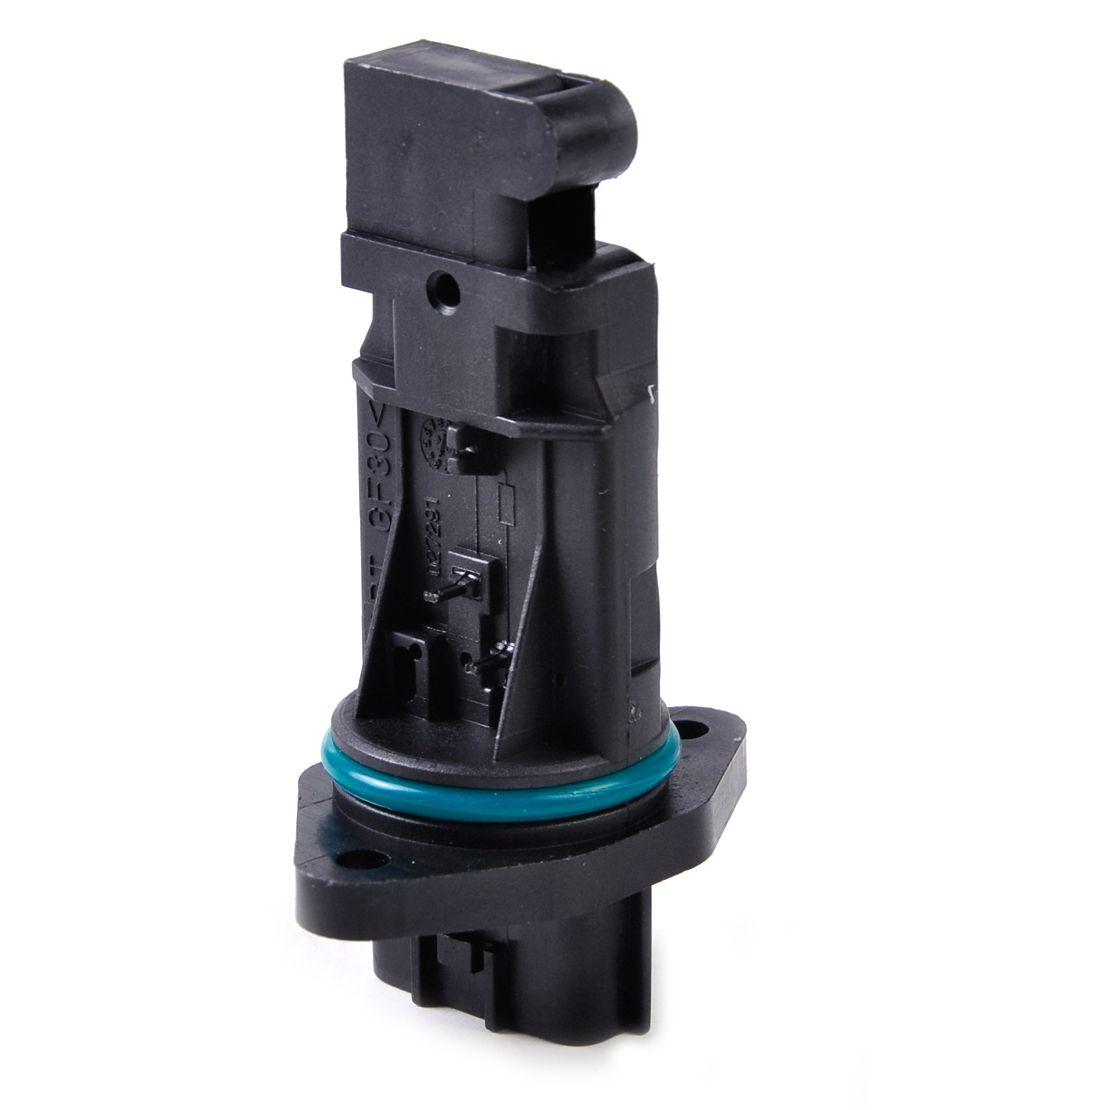 22680-4W000 22680-AD210 4Pin MAF Mass Air Flow Sensor Meter fit for Nissan Pathfinder Infiniti QX4 3.5L V6 2001 2002 2003